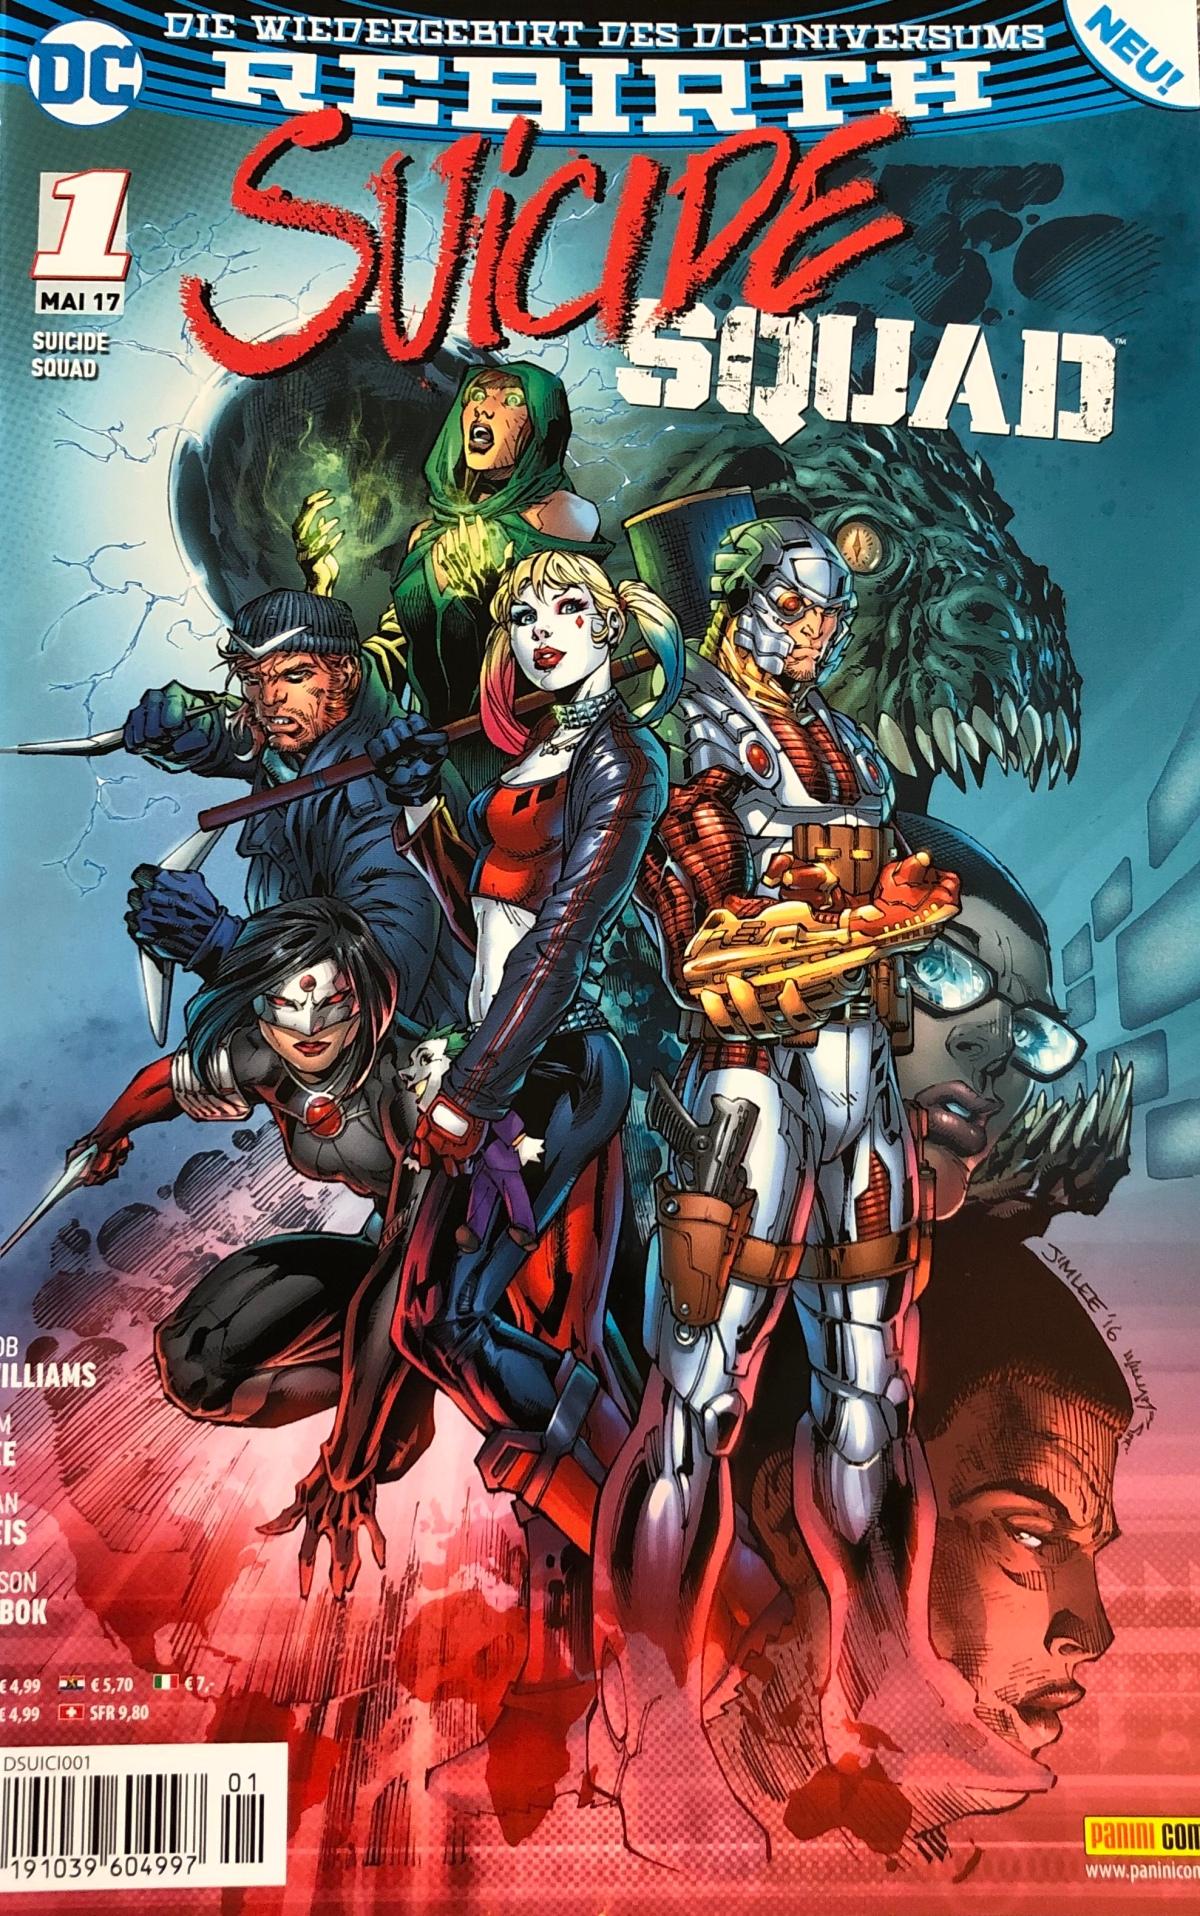 Suicide Squad #1 & #2 (DC Rebirth)| English Review#20